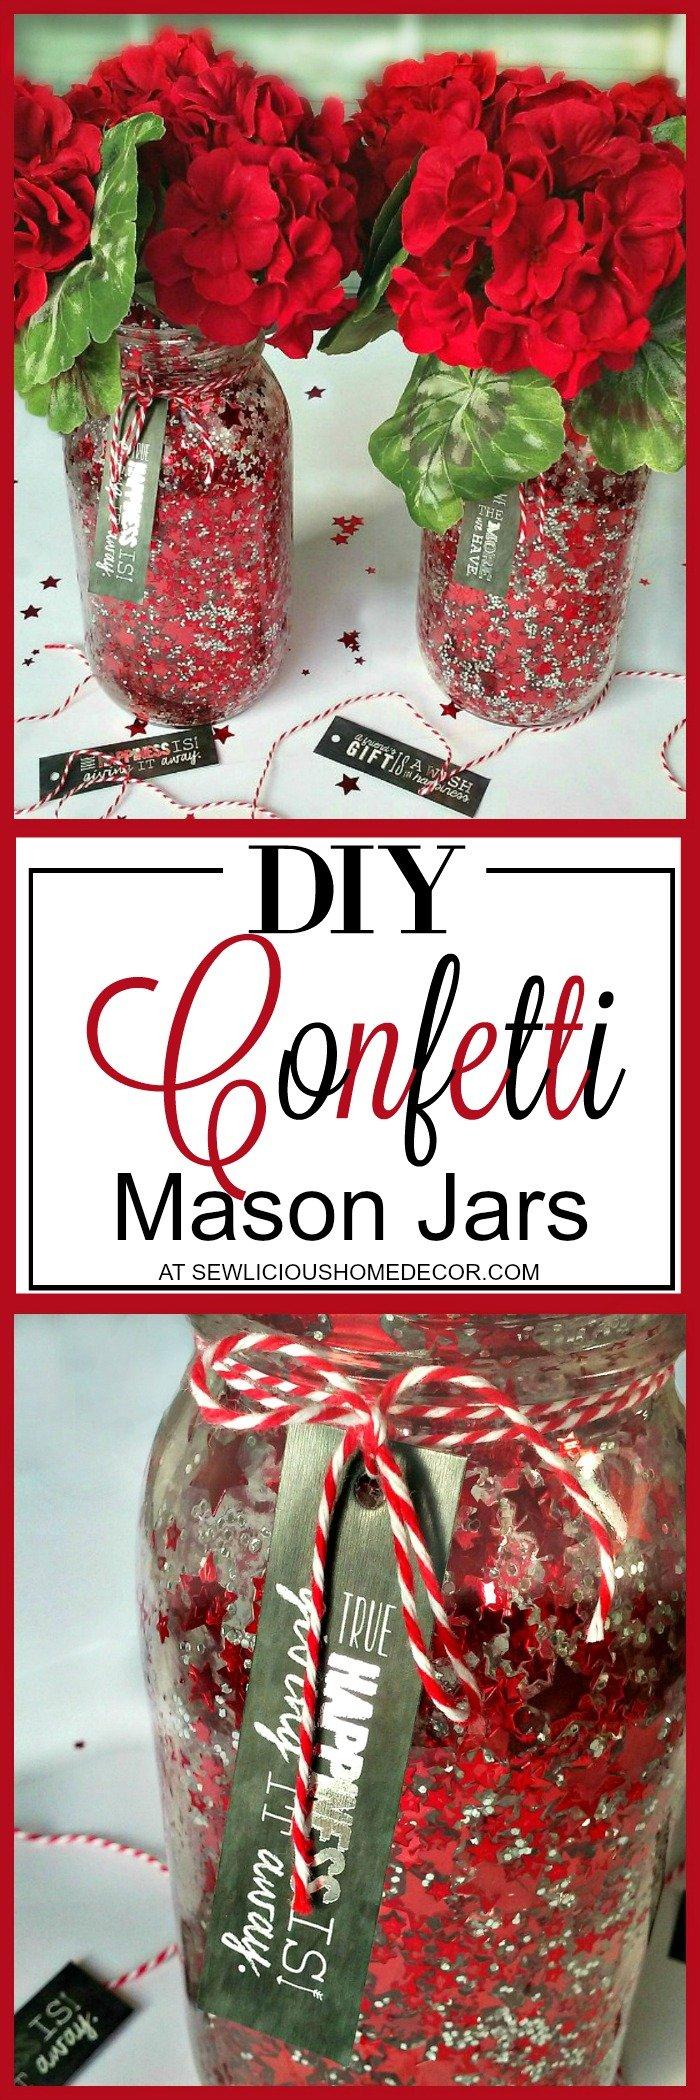 DIY Confetti Mason Jar Crafts at sewlicioushomedecor.com